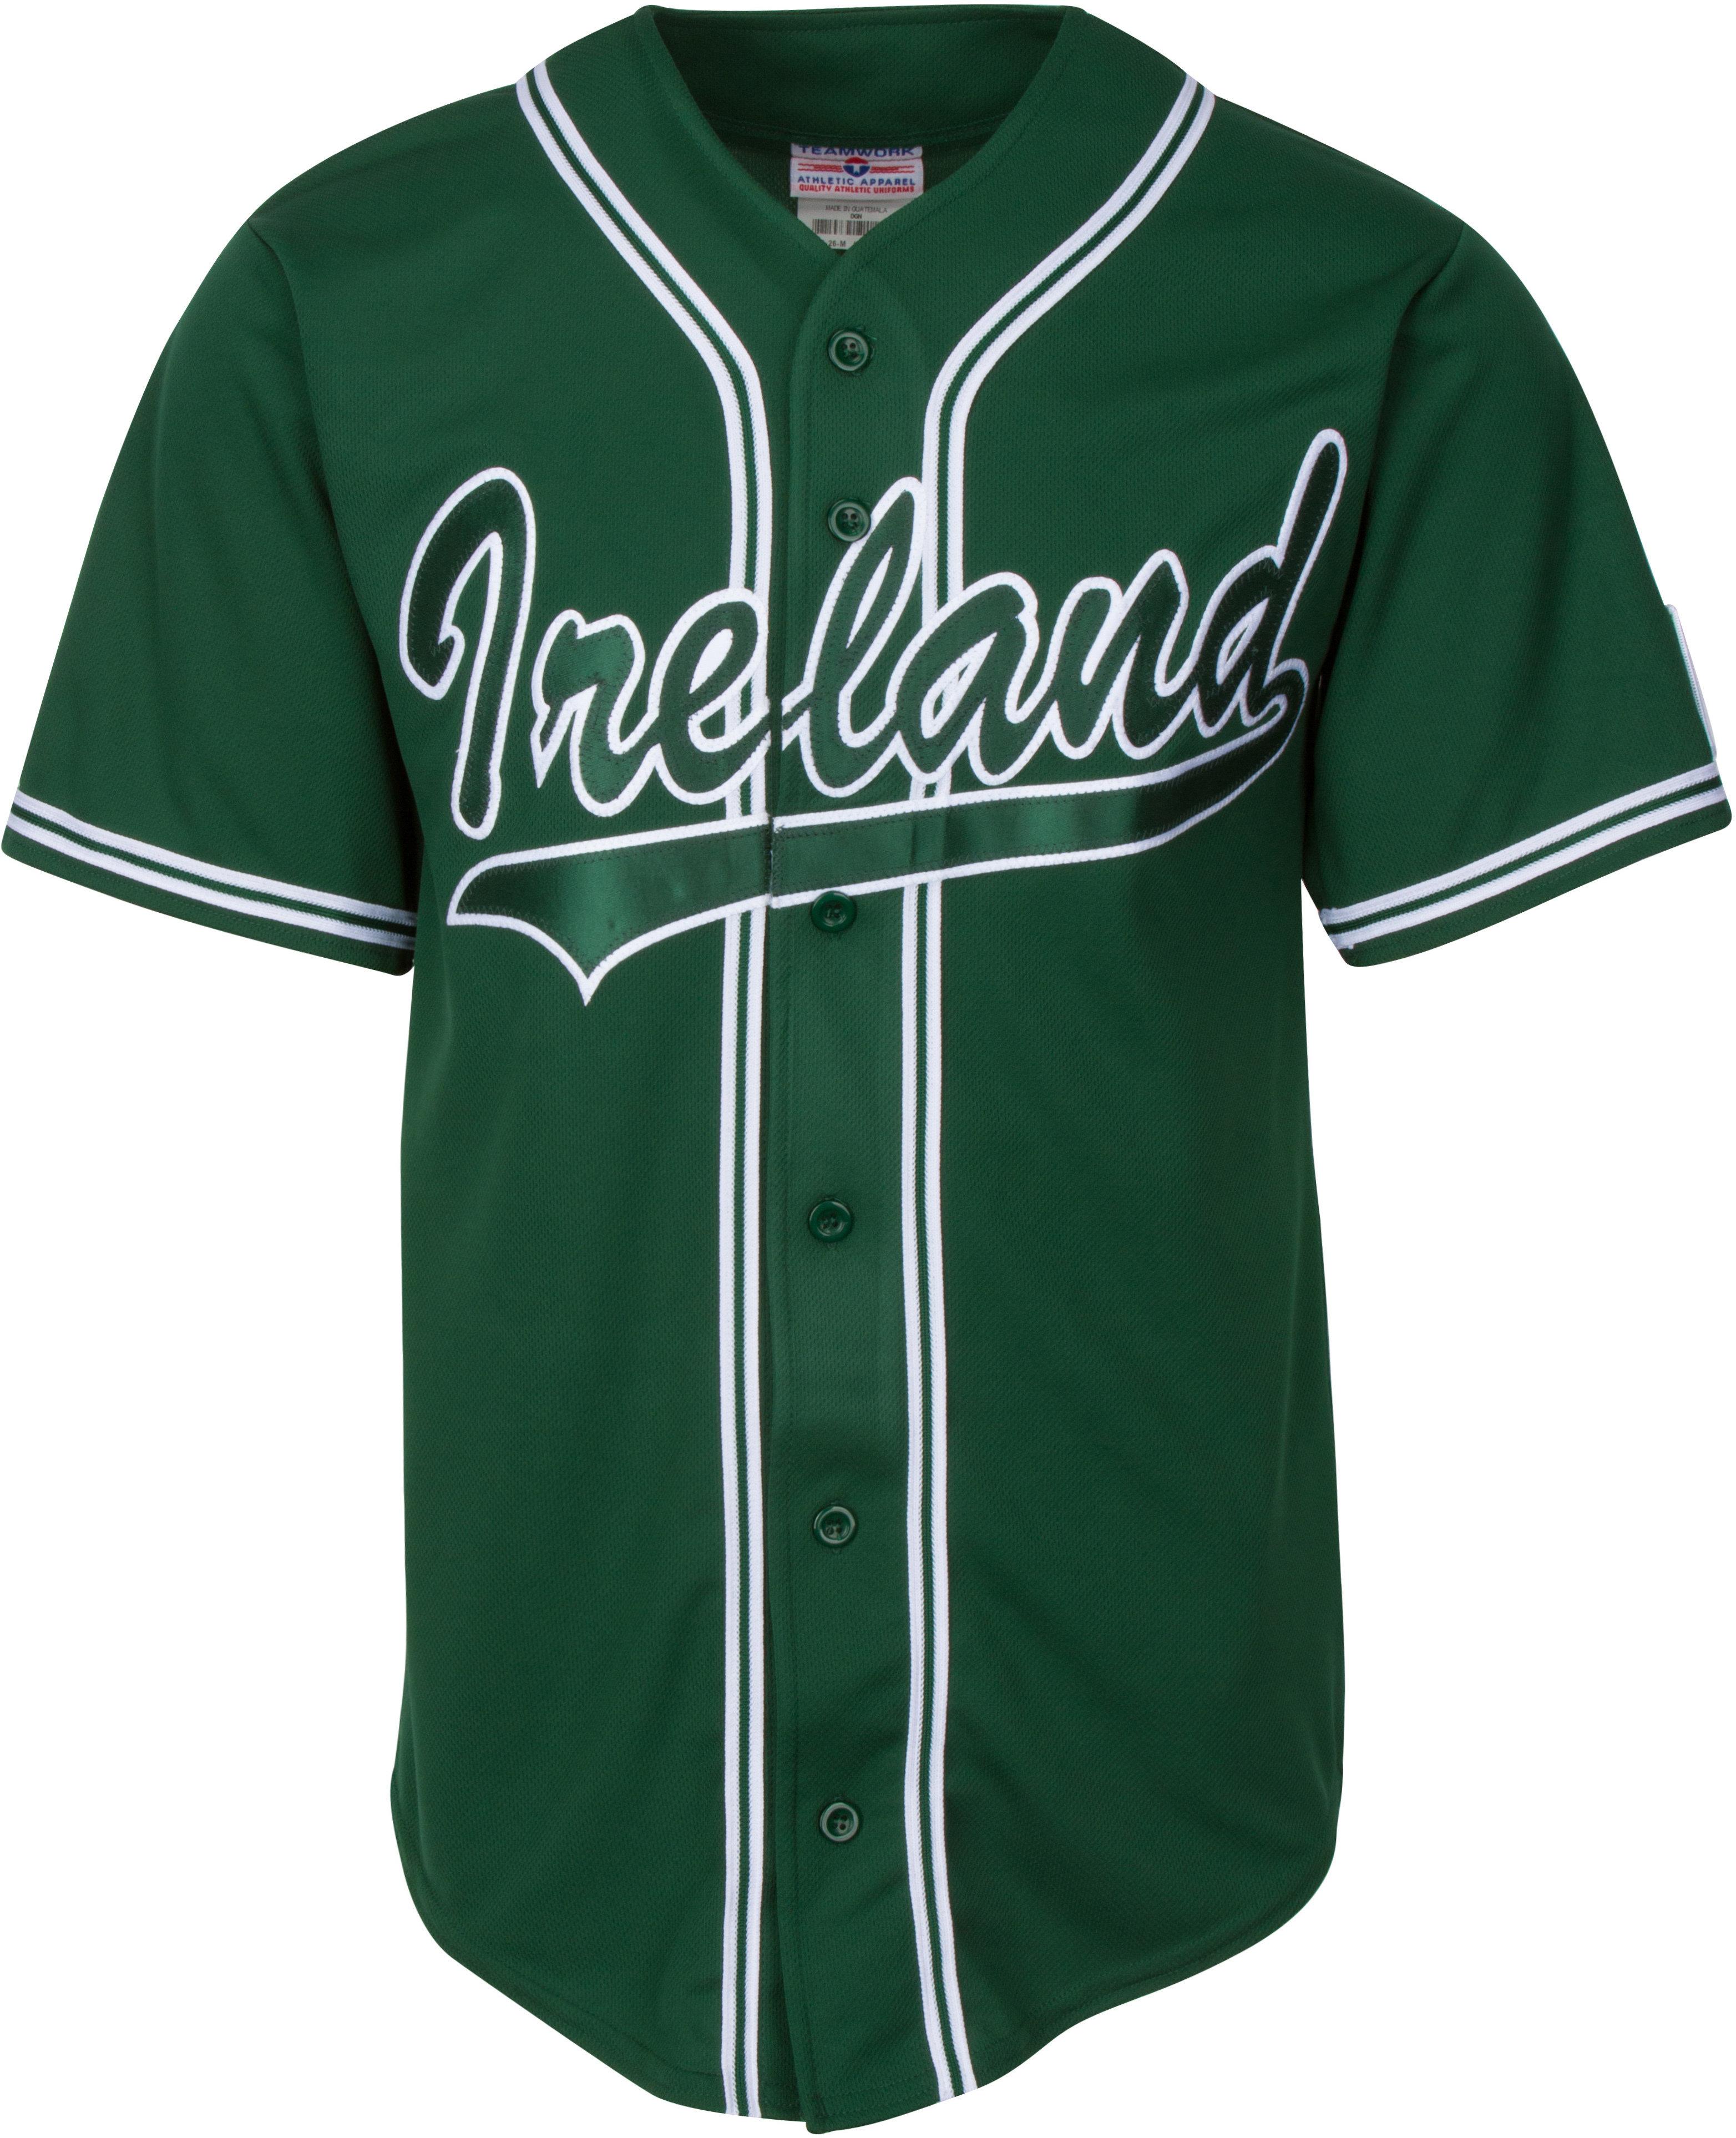 Team Ireland Irish National Baseball Team GREEN Customized Game Jersey IRLJER004